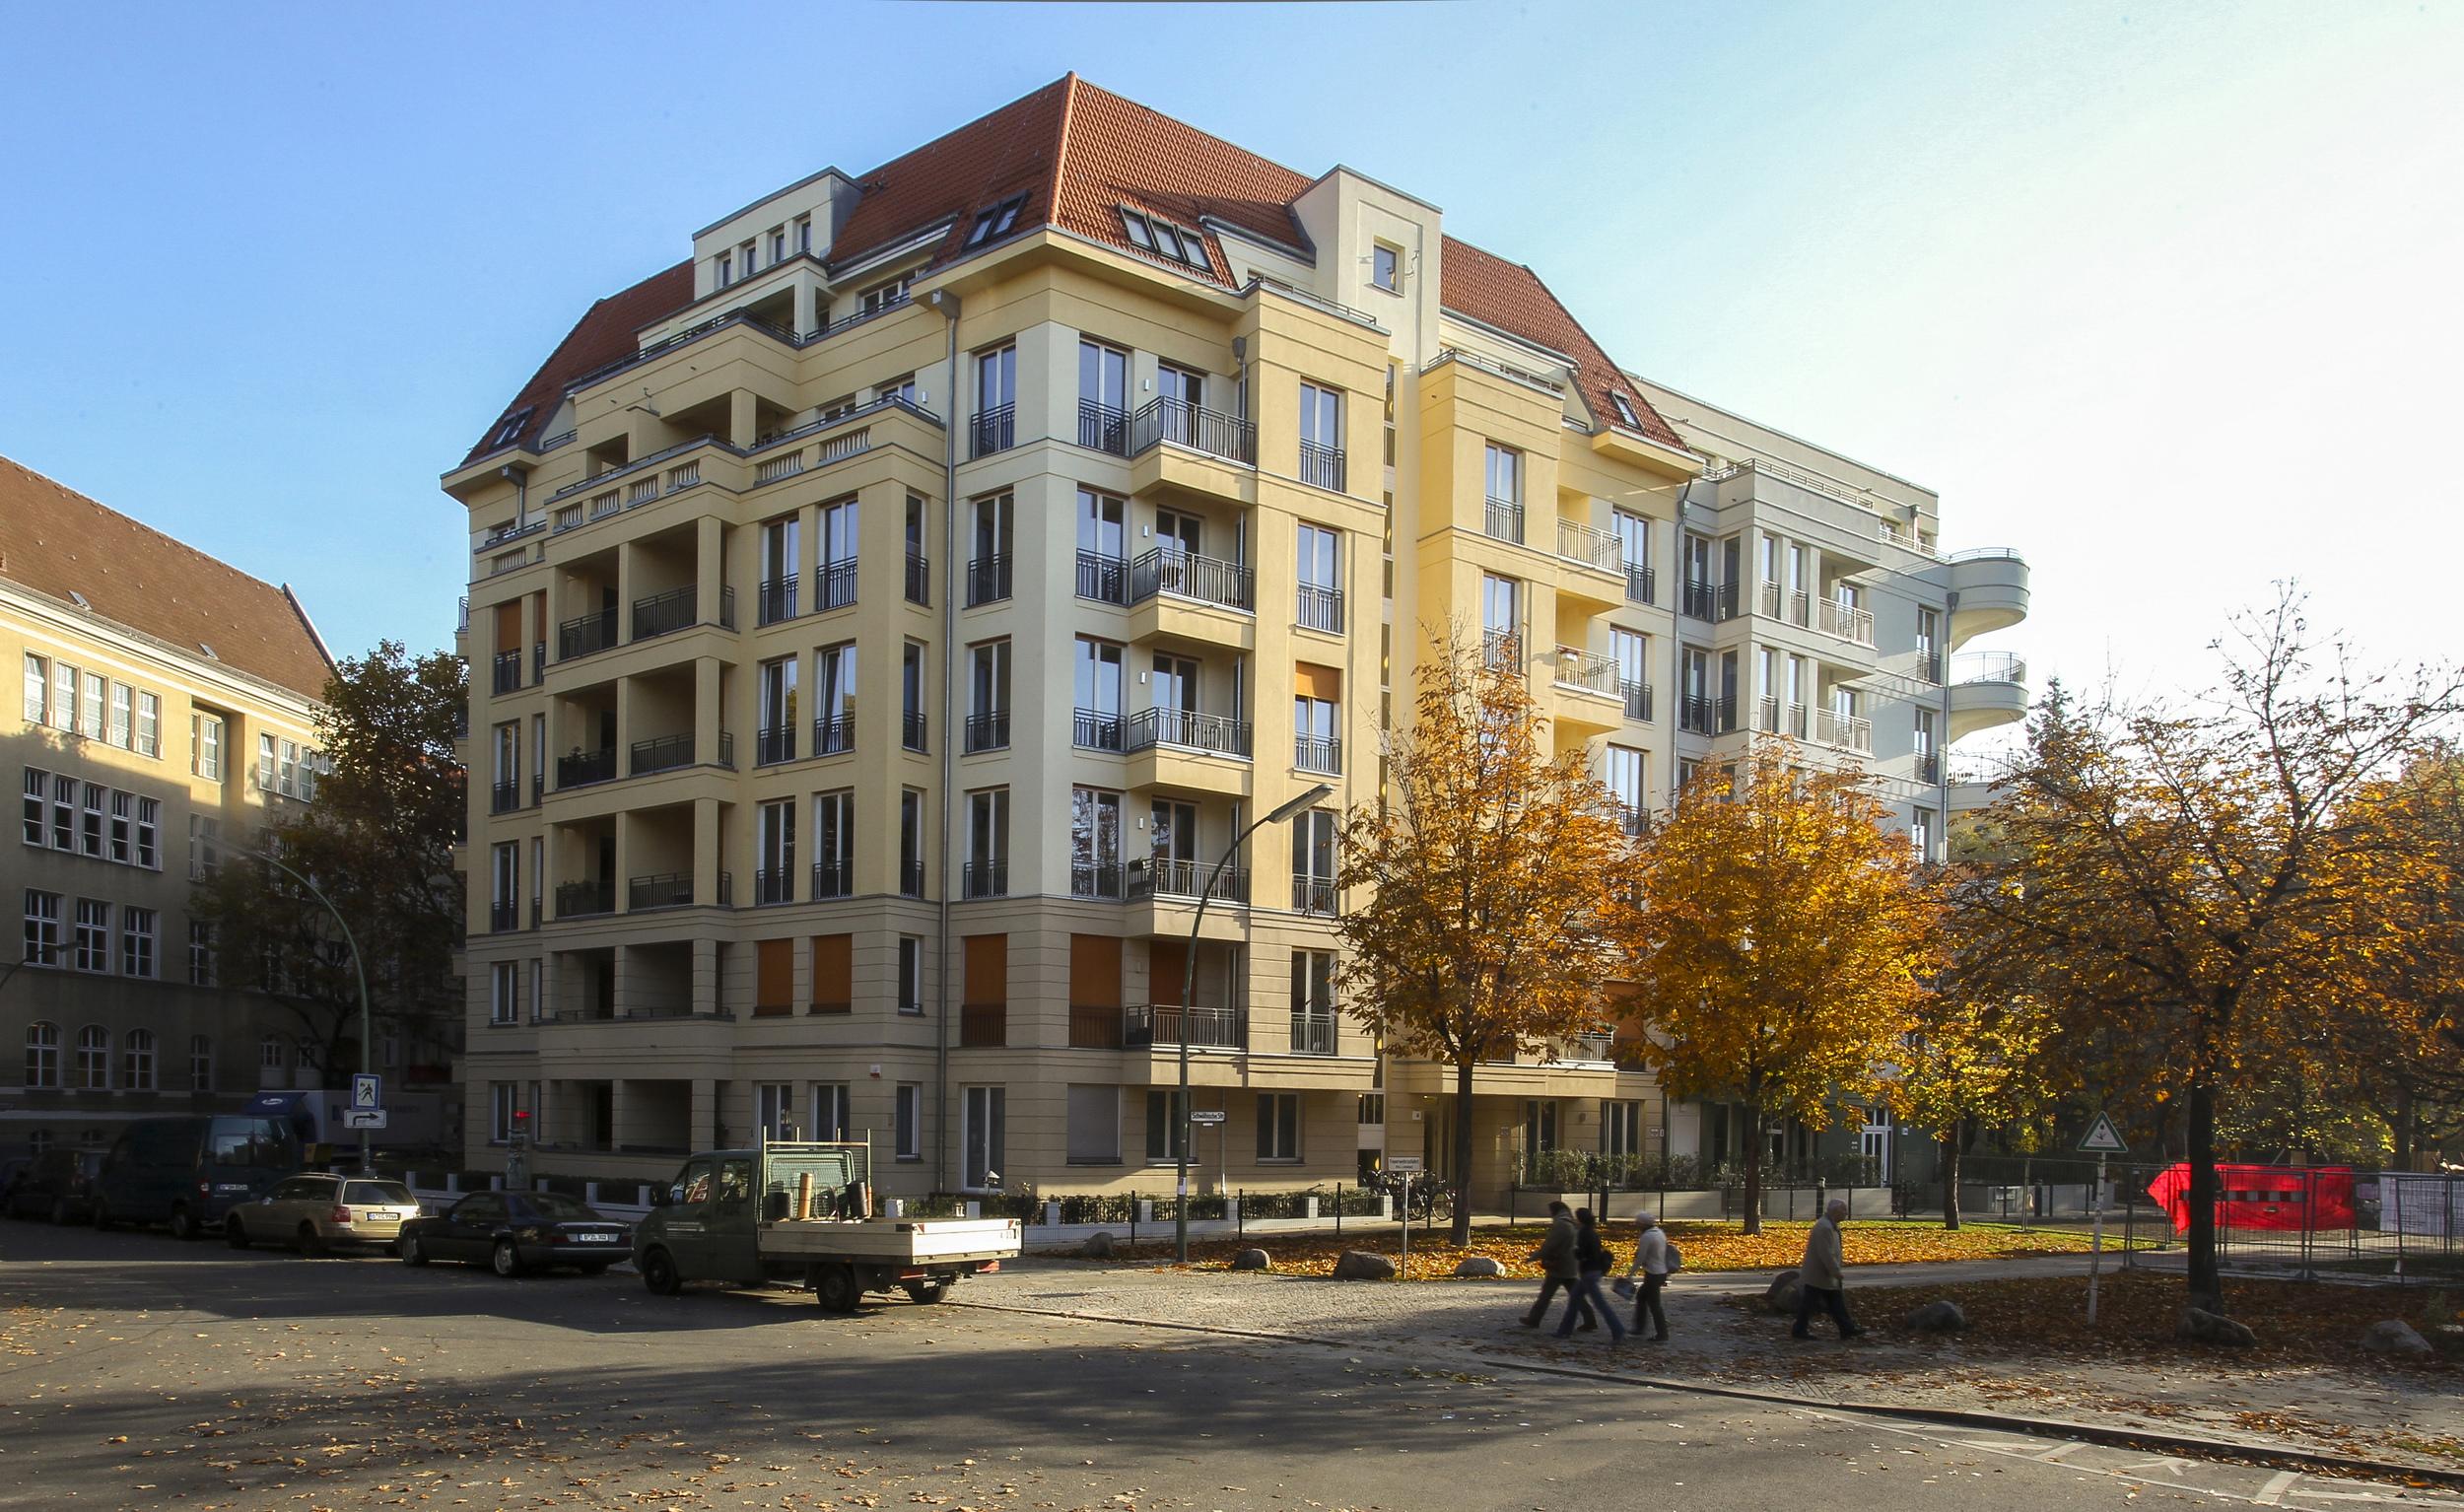 LIGNE ARCHITEKTEN Barbarossaplatz 2.jpg